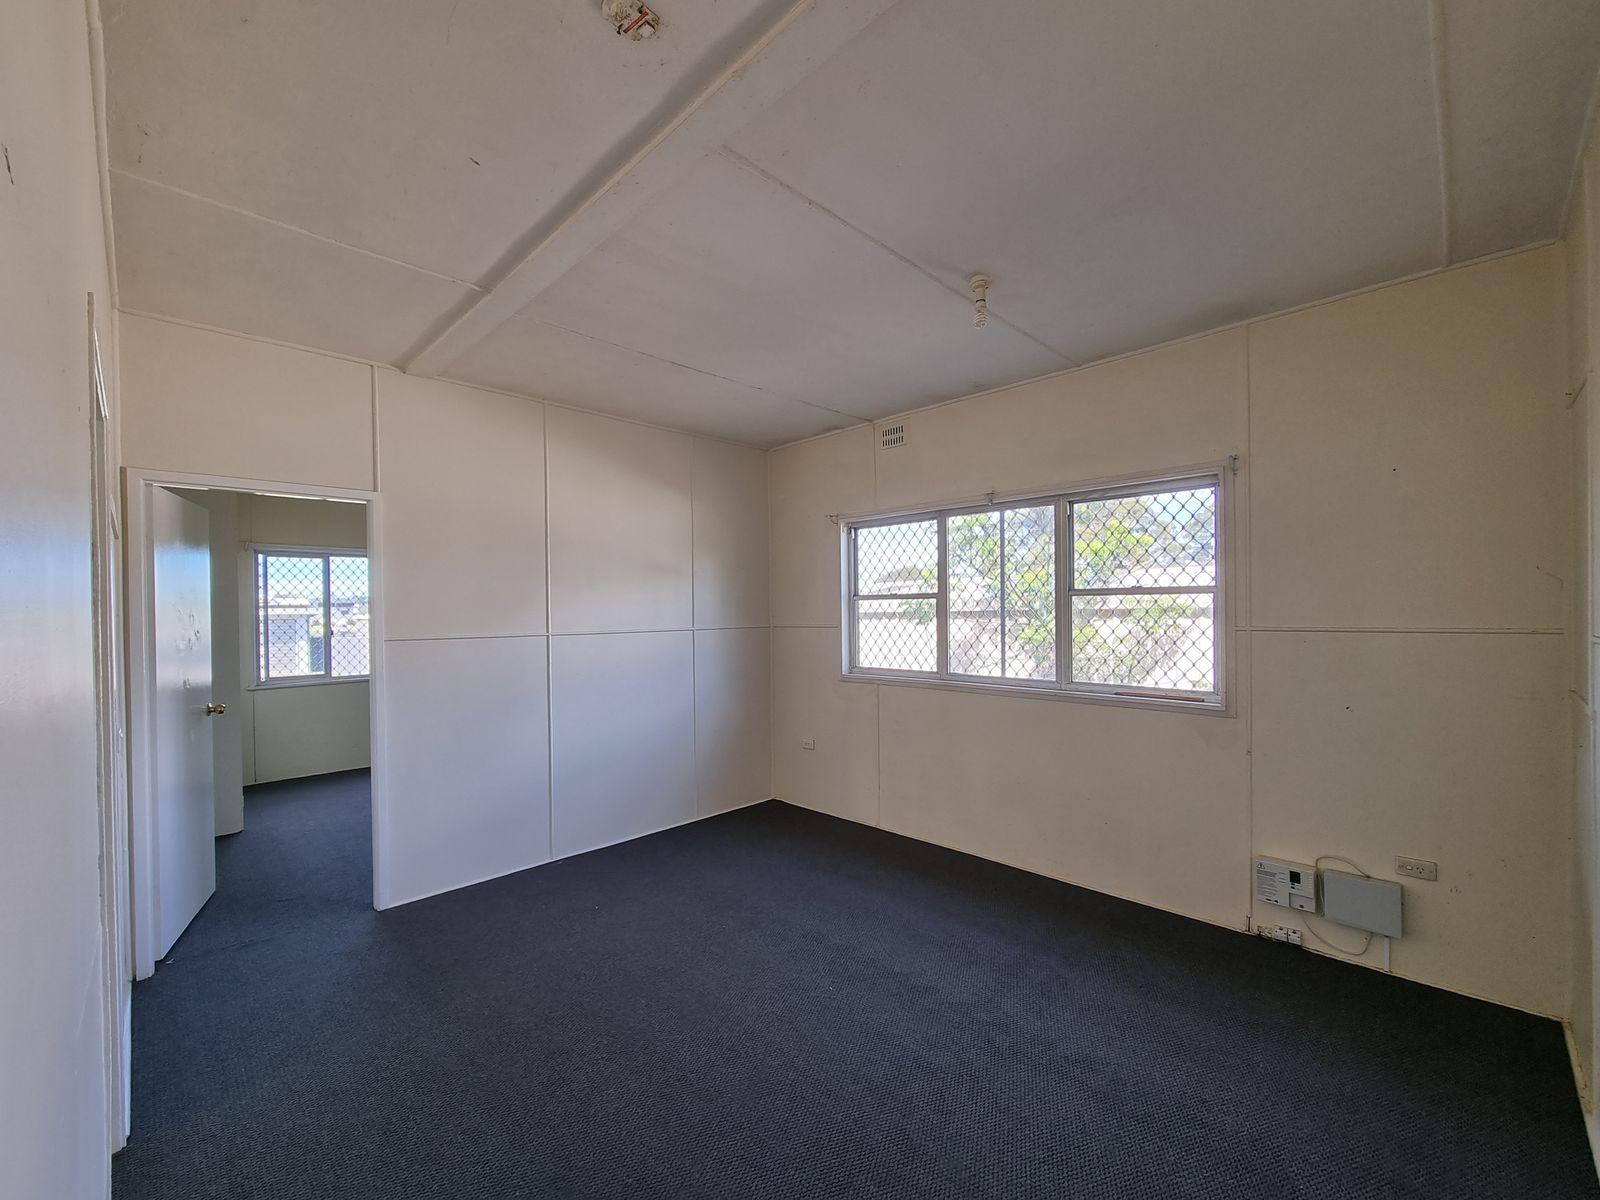 1 St Vincent Street, Taree, NSW 2430